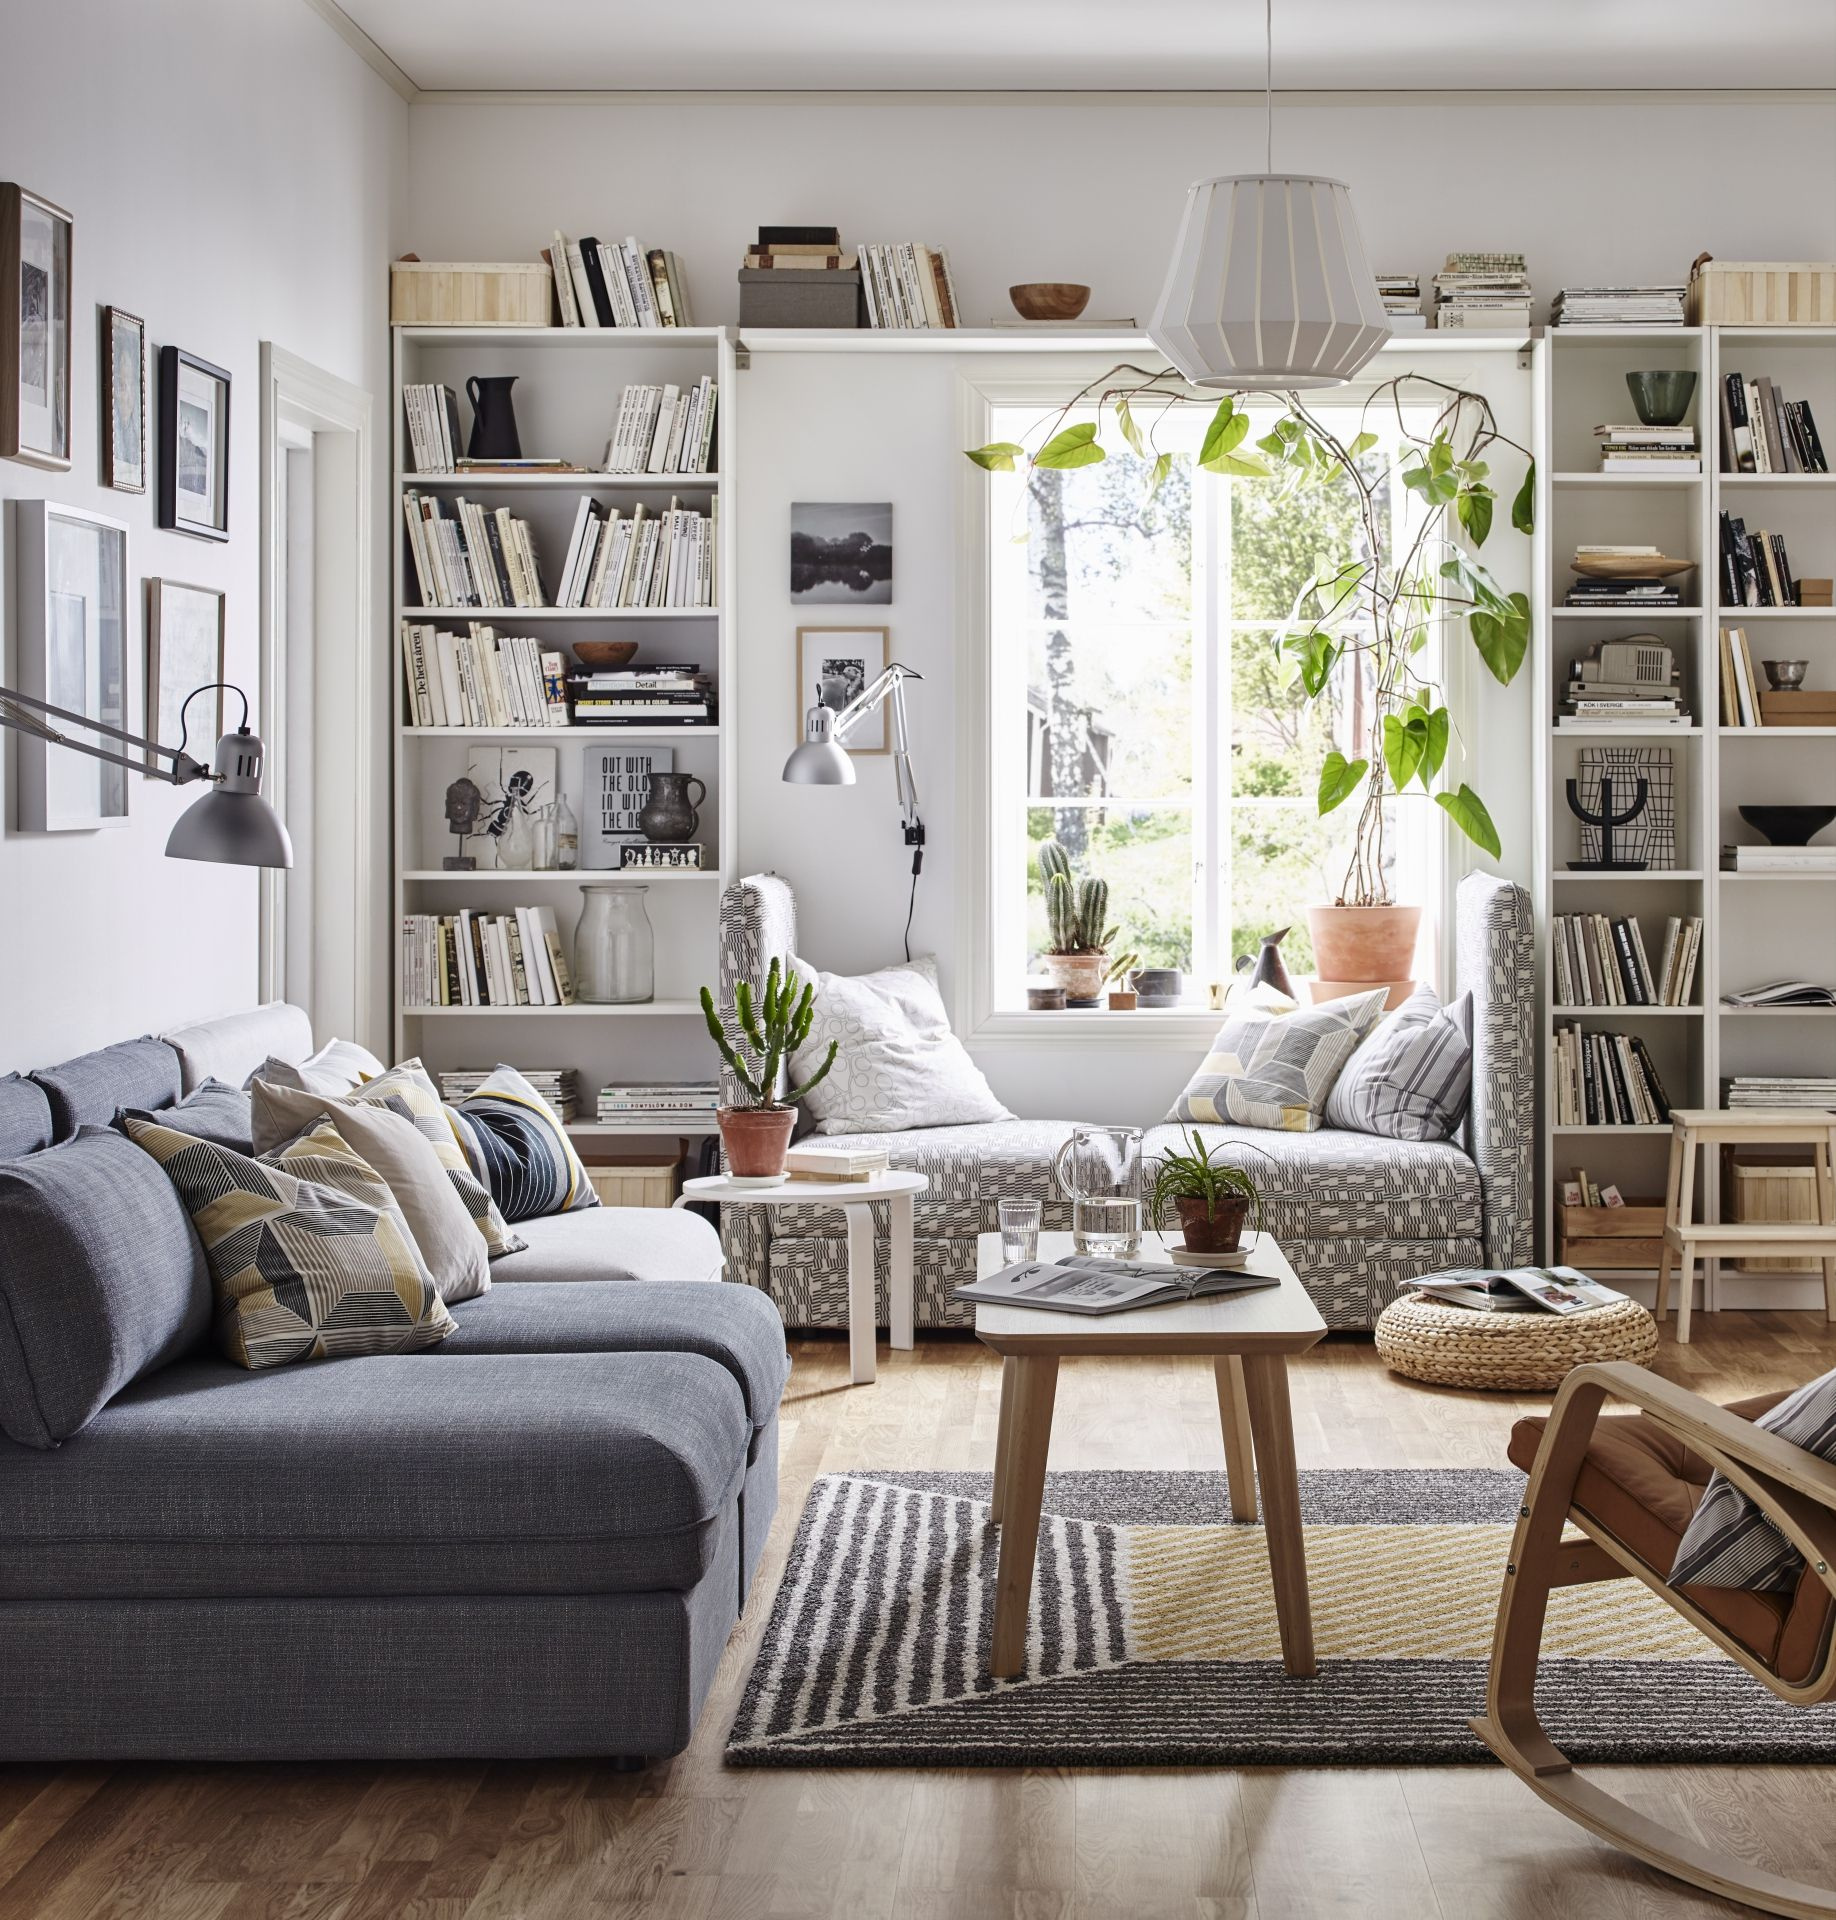 Billy Boekenkast Ikea Ikeanederland Inspiratie